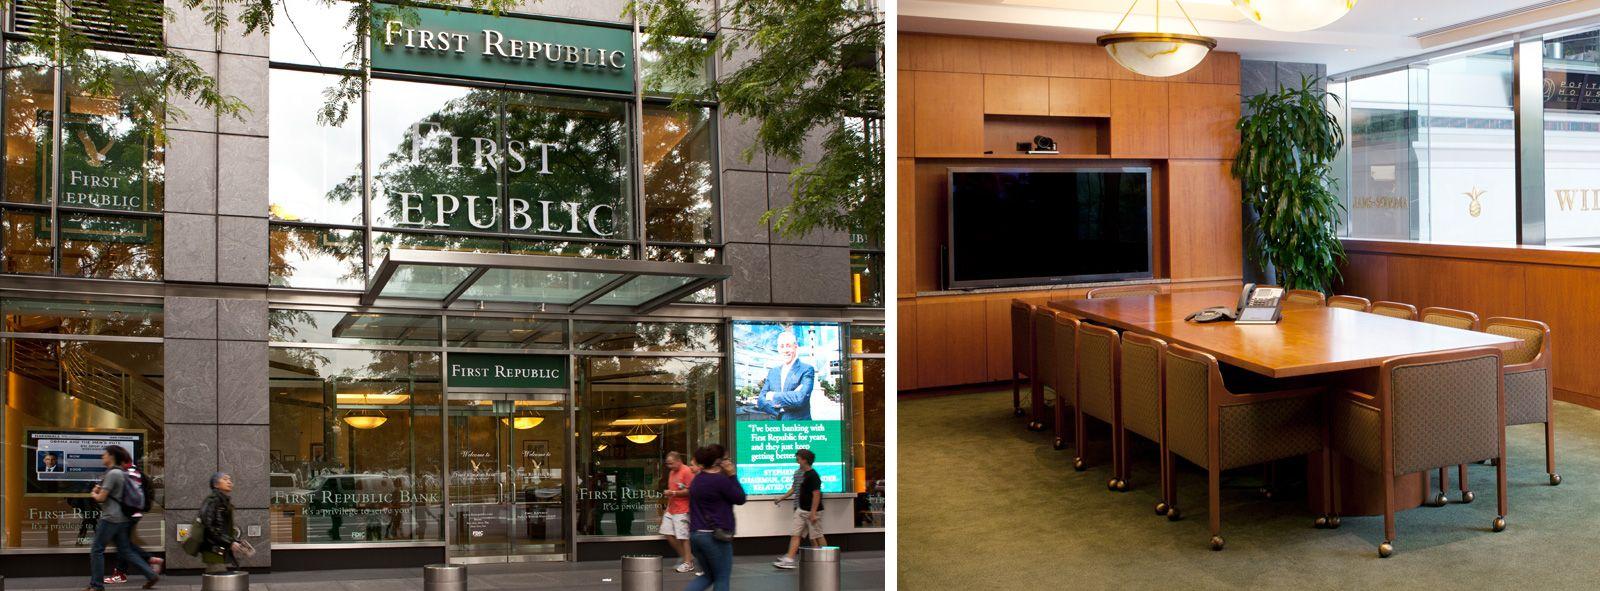 Time Warner Center | First Republic Bank